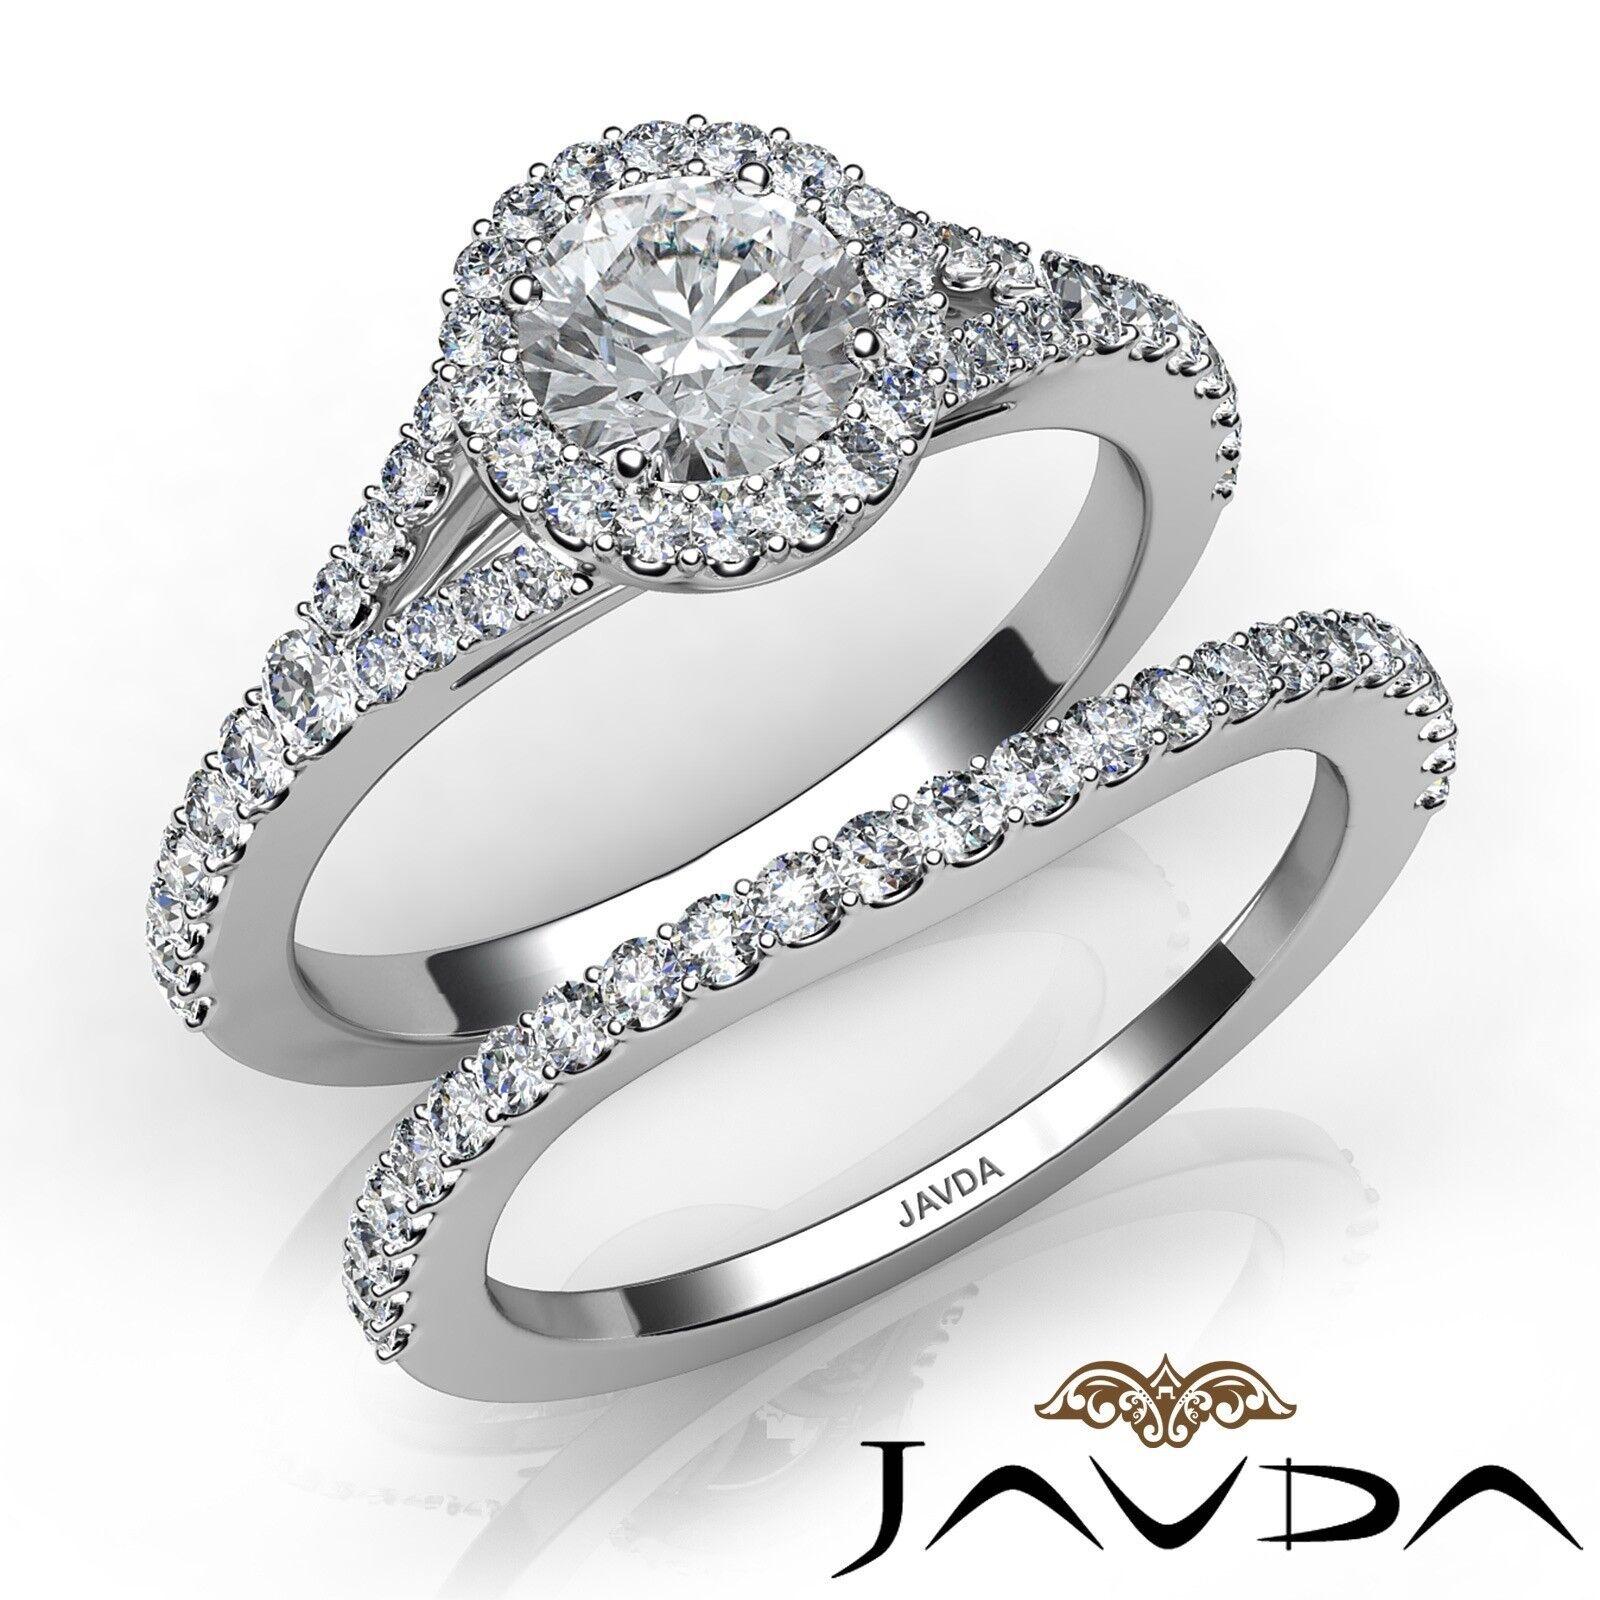 1.34ctw Floating Halo Bridal Set Round Diamond Engagement Ring GIA J-VVS2 W Gold